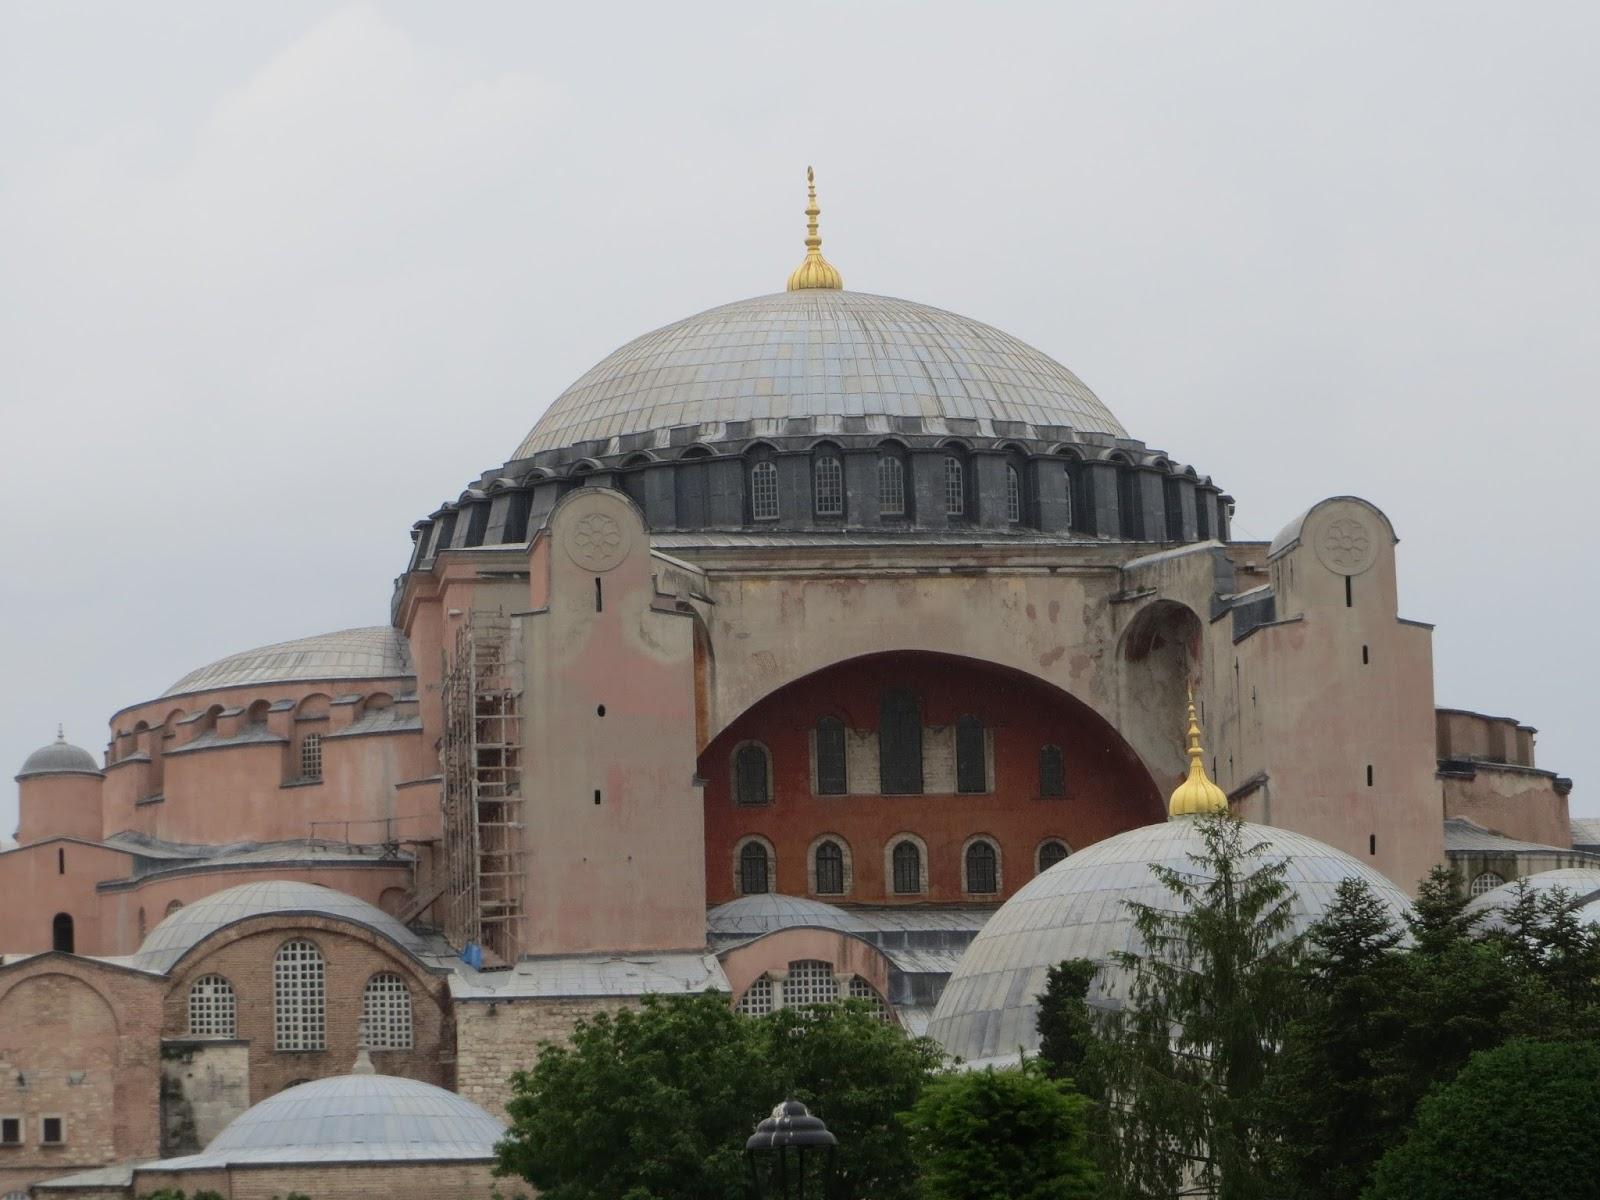 londinoupolis: The Dome in Hagia Sophia, Constantinople